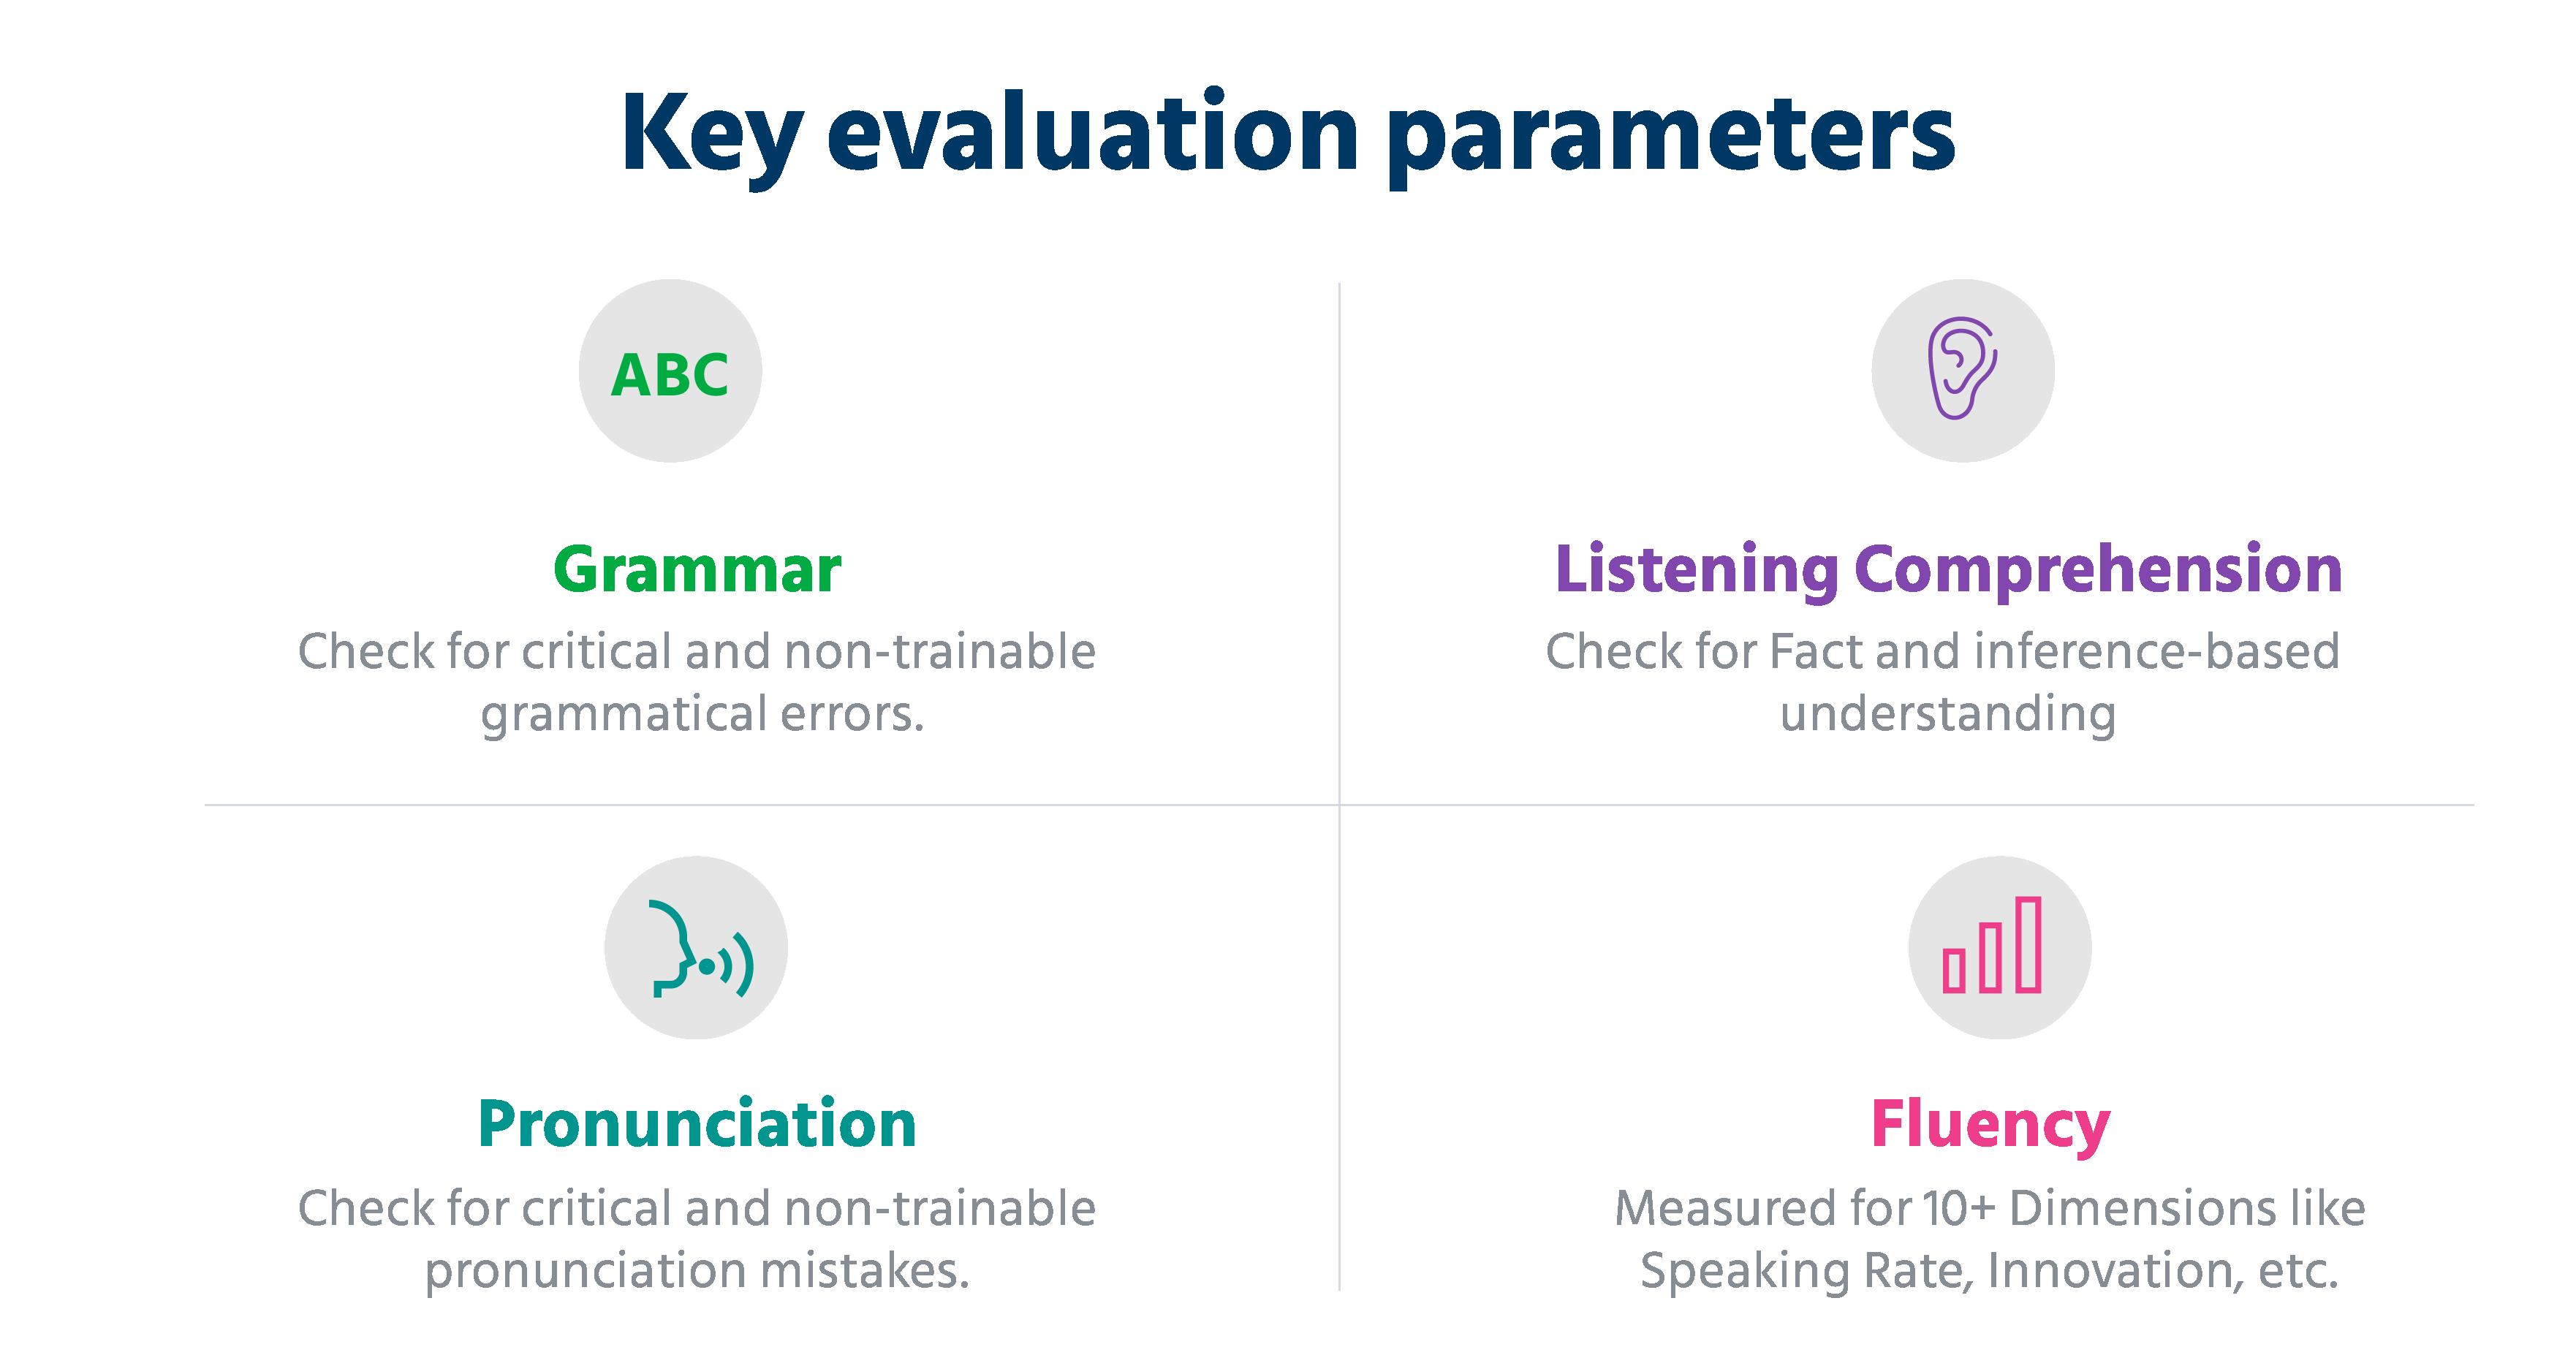 key evaluation parameters for evaluating communication skills